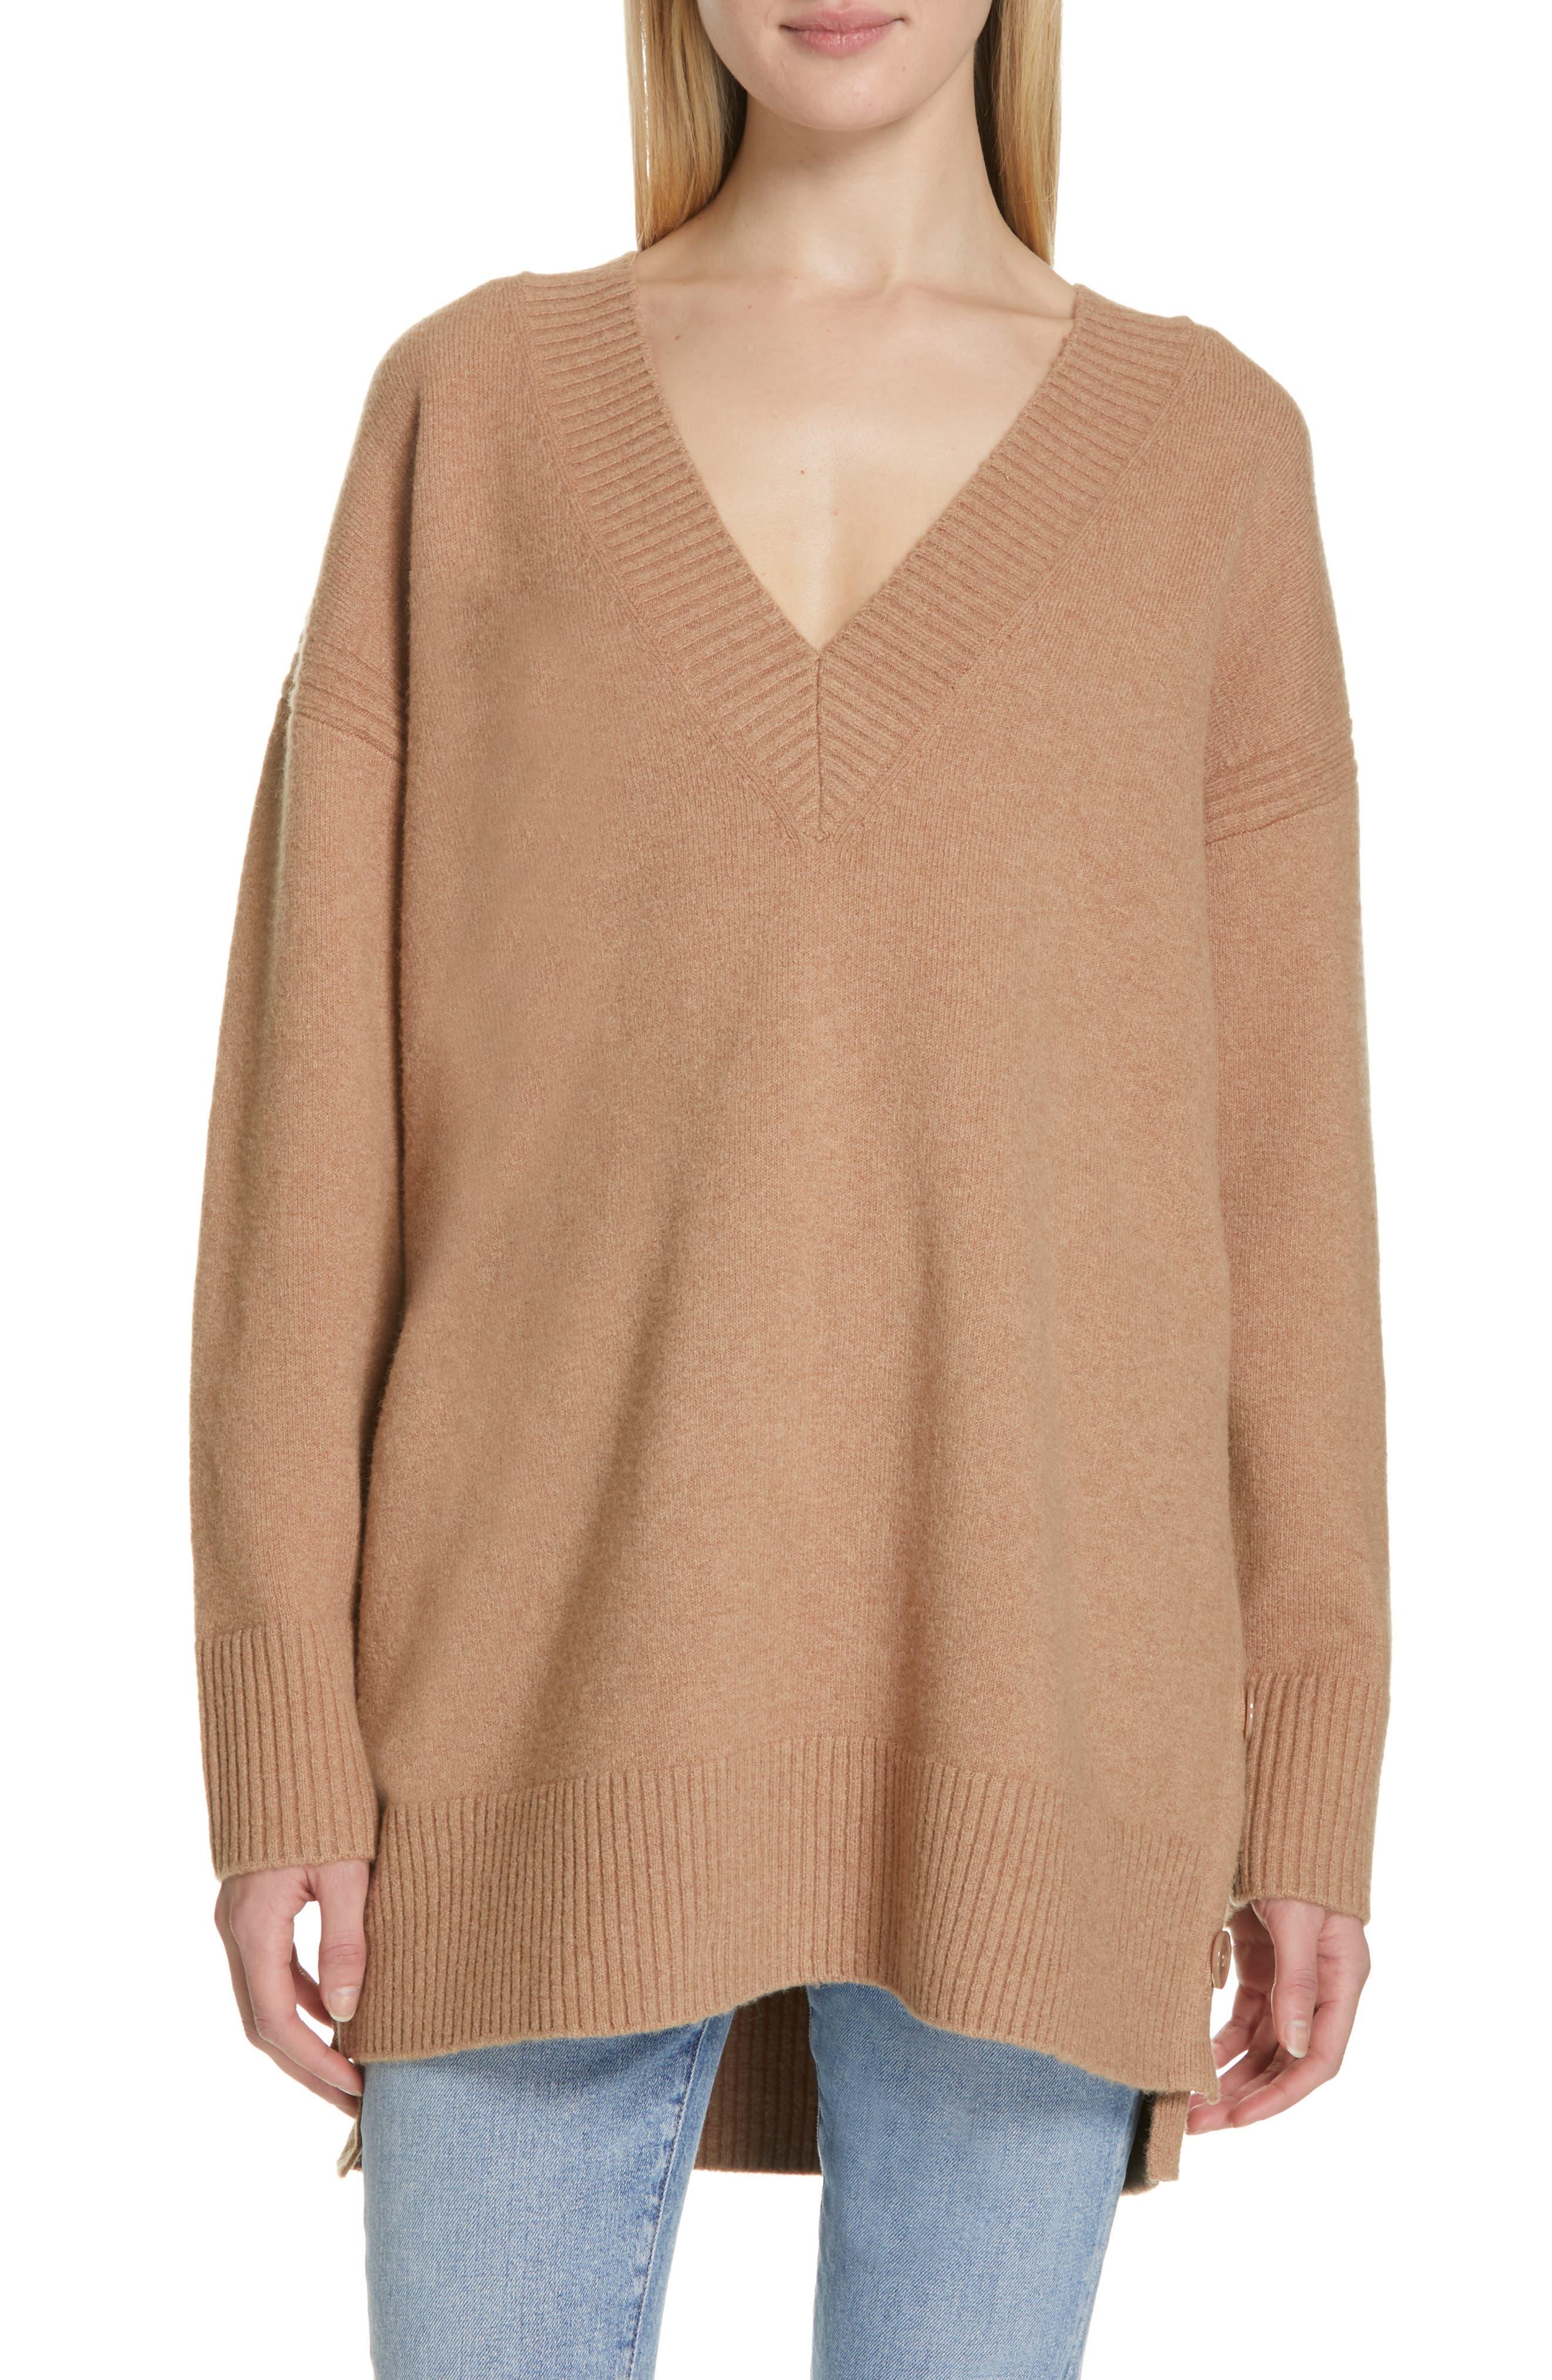 Cortis Merino Wool & Alpaca Blend Sweater,                             Main thumbnail 1, color,                             CAMEL